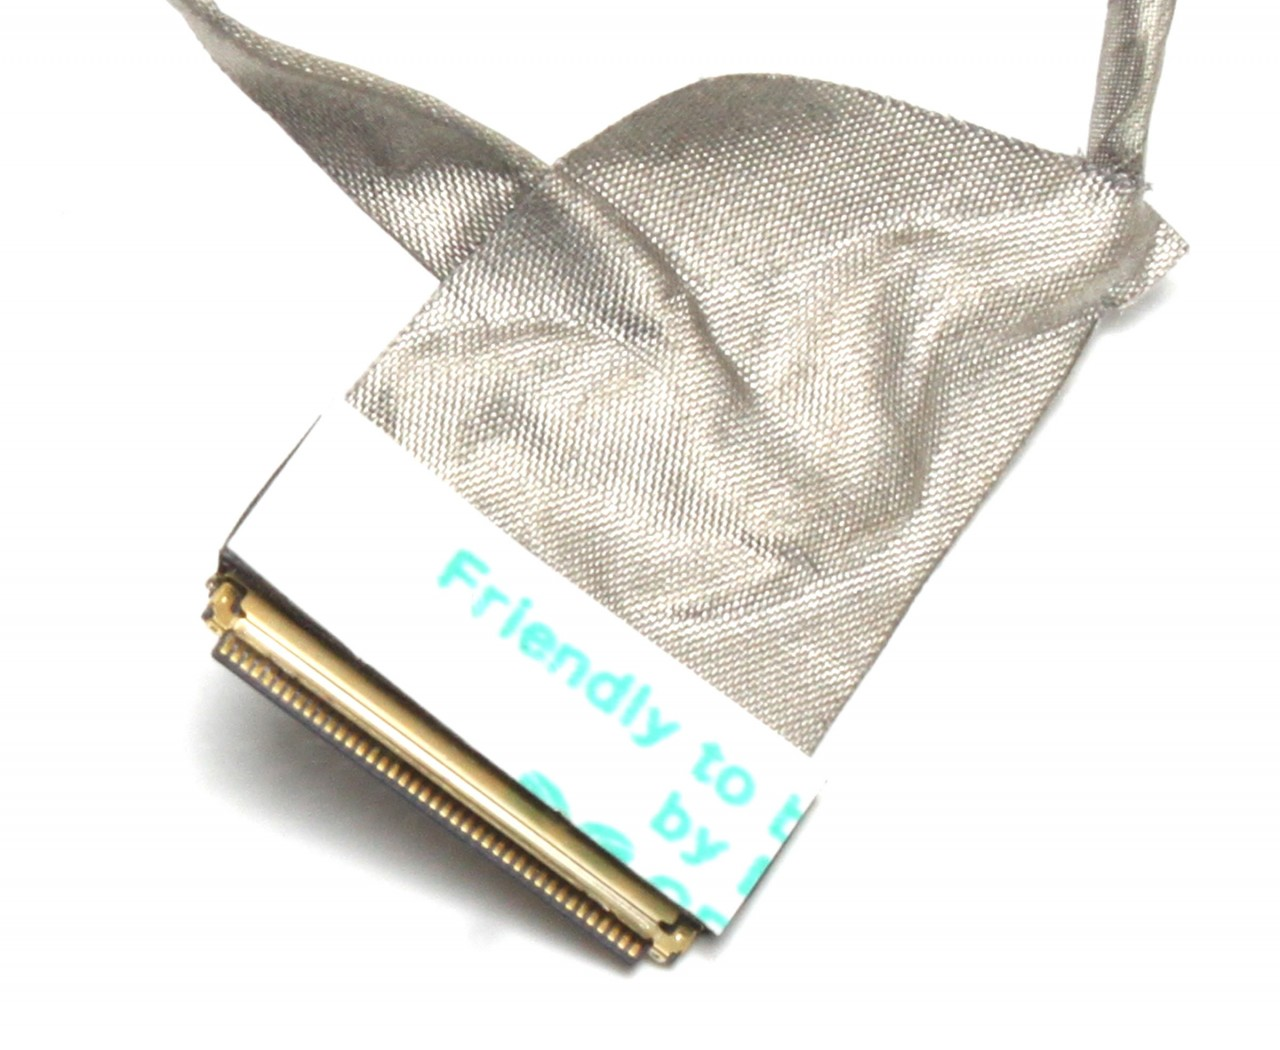 Cablu video LVDS Fujitsu DDFH2ALC000 imagine powerlaptop.ro 2021